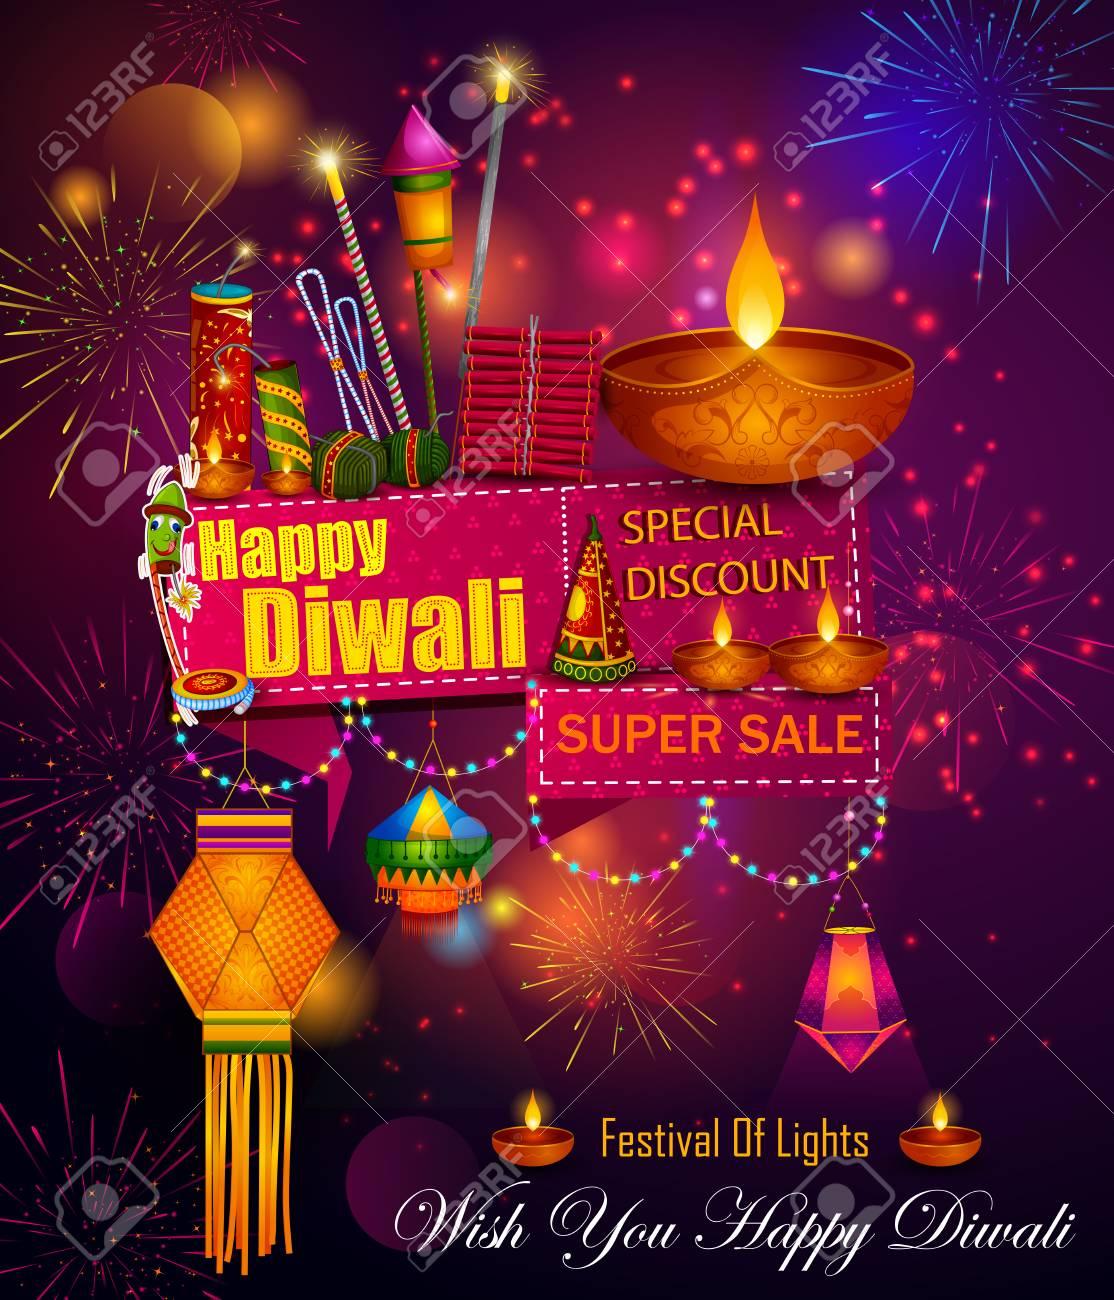 Happy Diwali Light Festival Of India Greeting Advertisement Sale